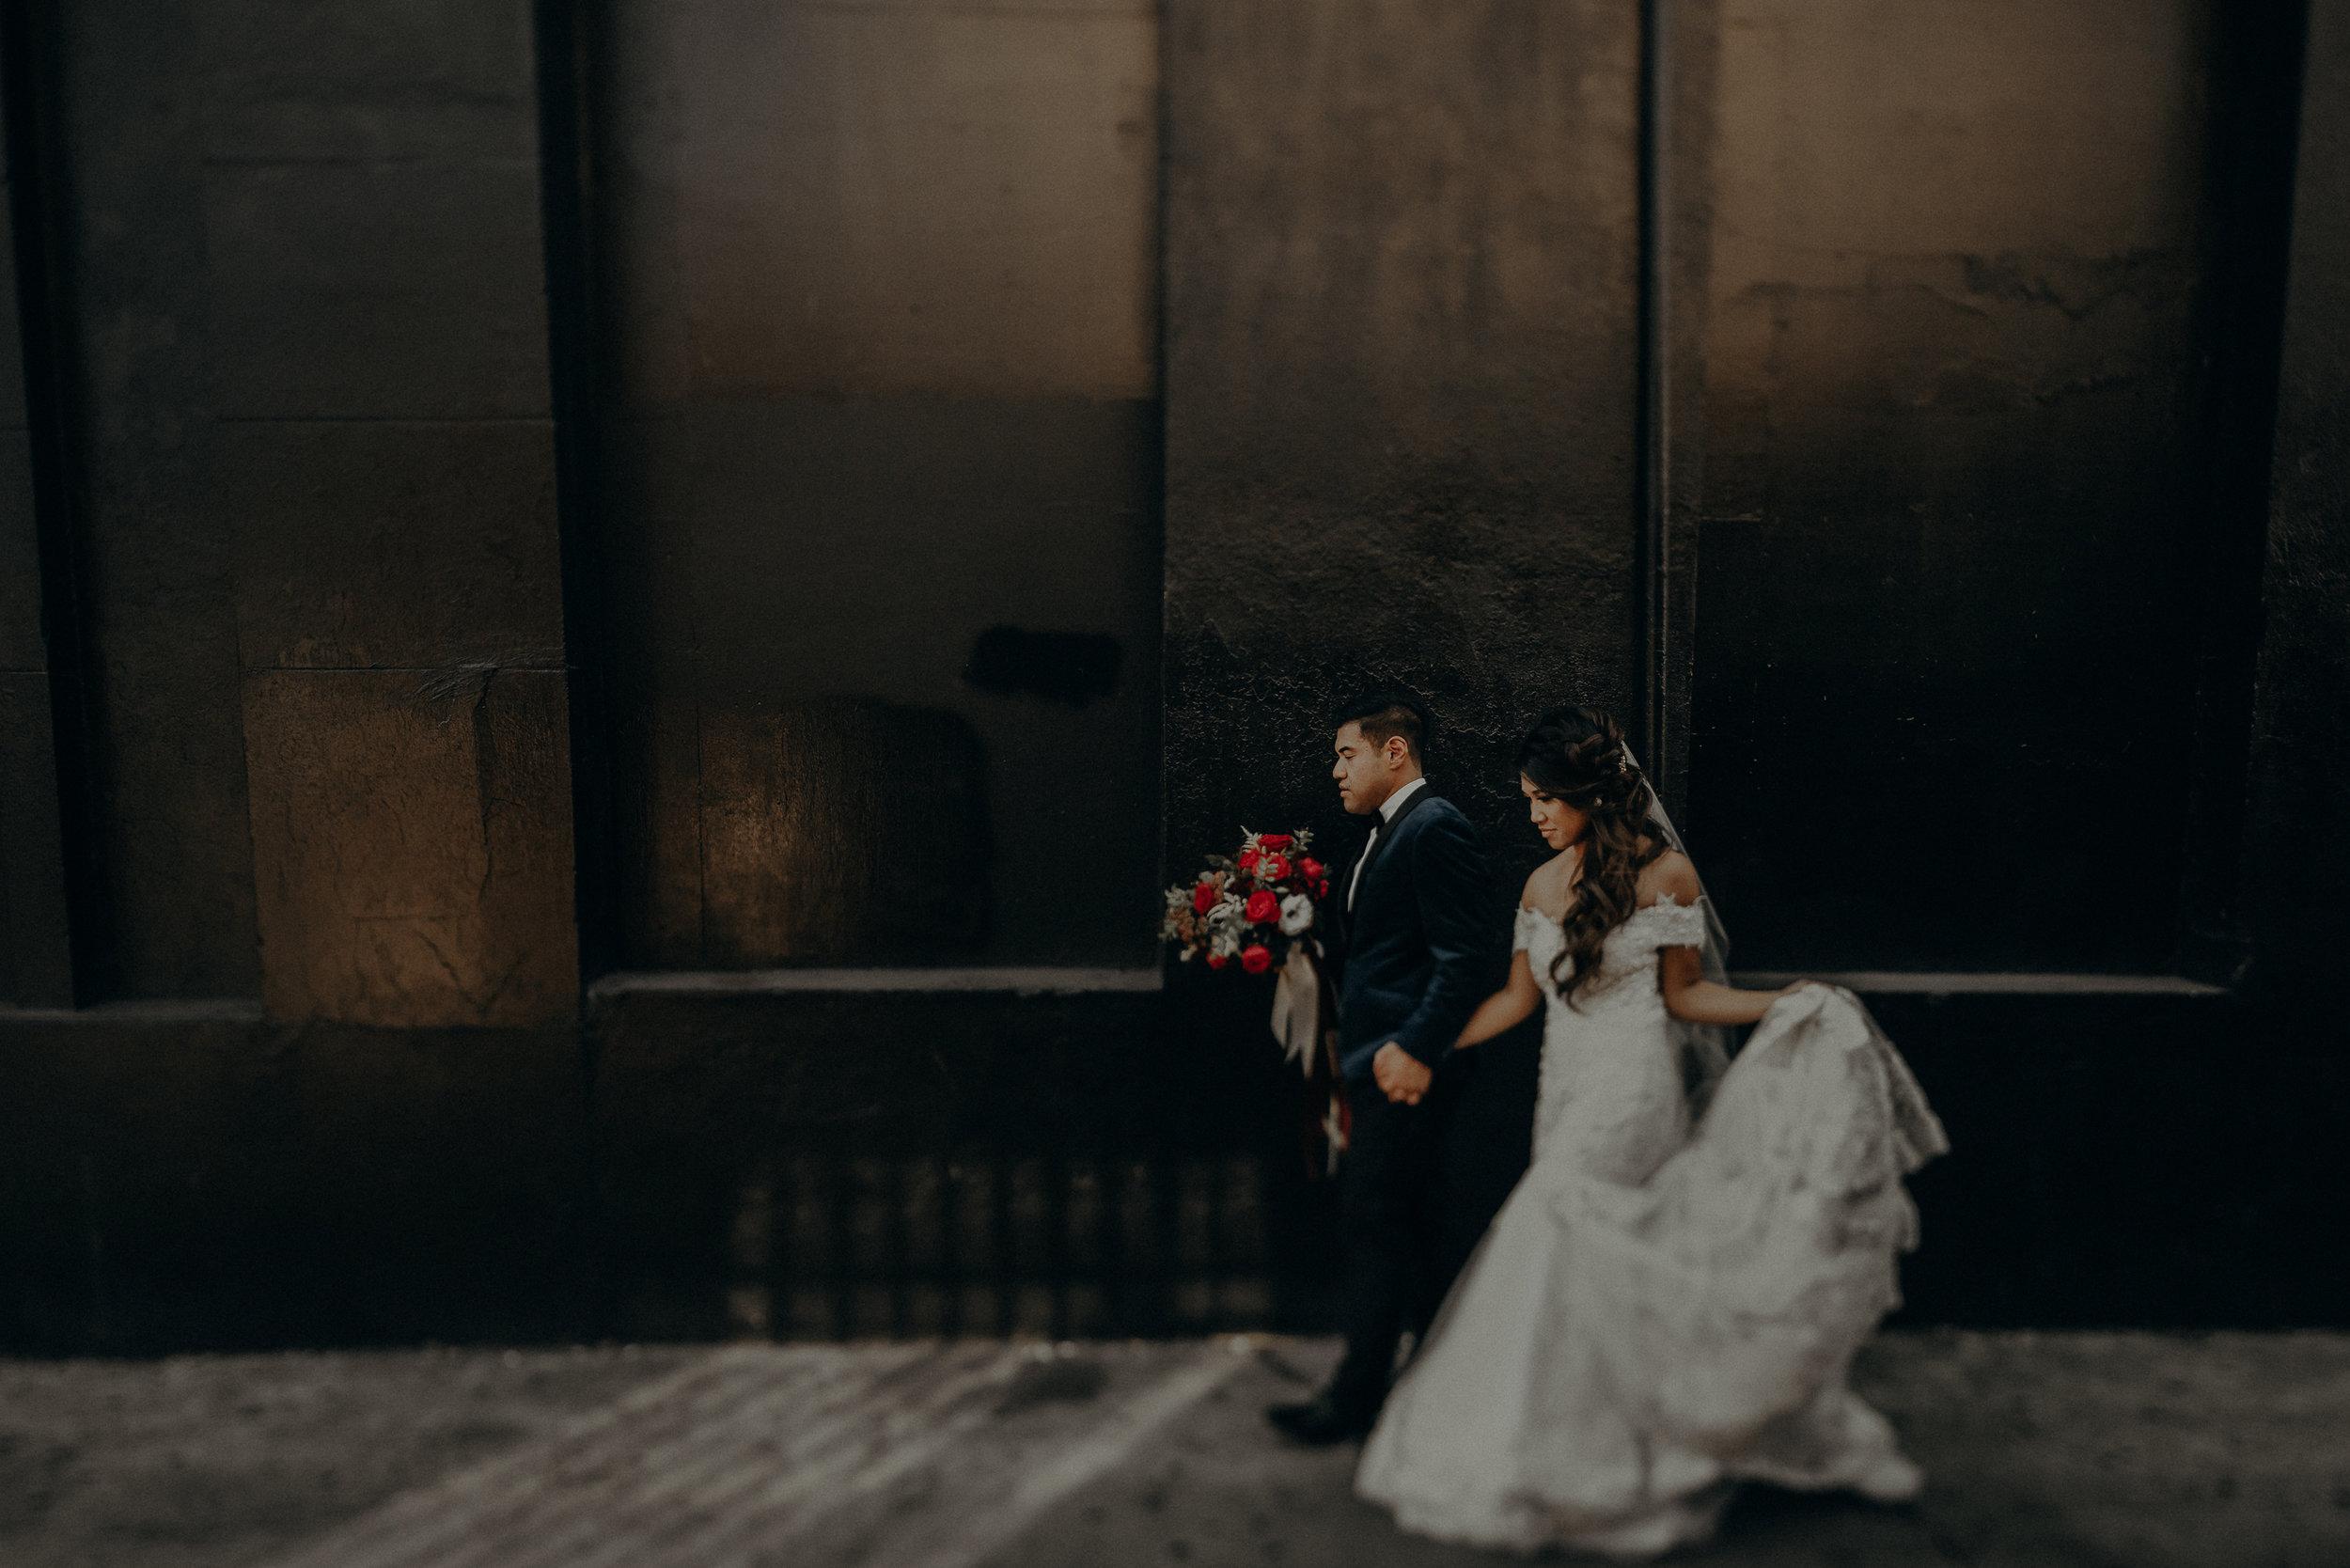 ©Isaiah + Taylor Photography - the Loft on Pine Wedding, Long Beach Wedding Photographer-133.jpg